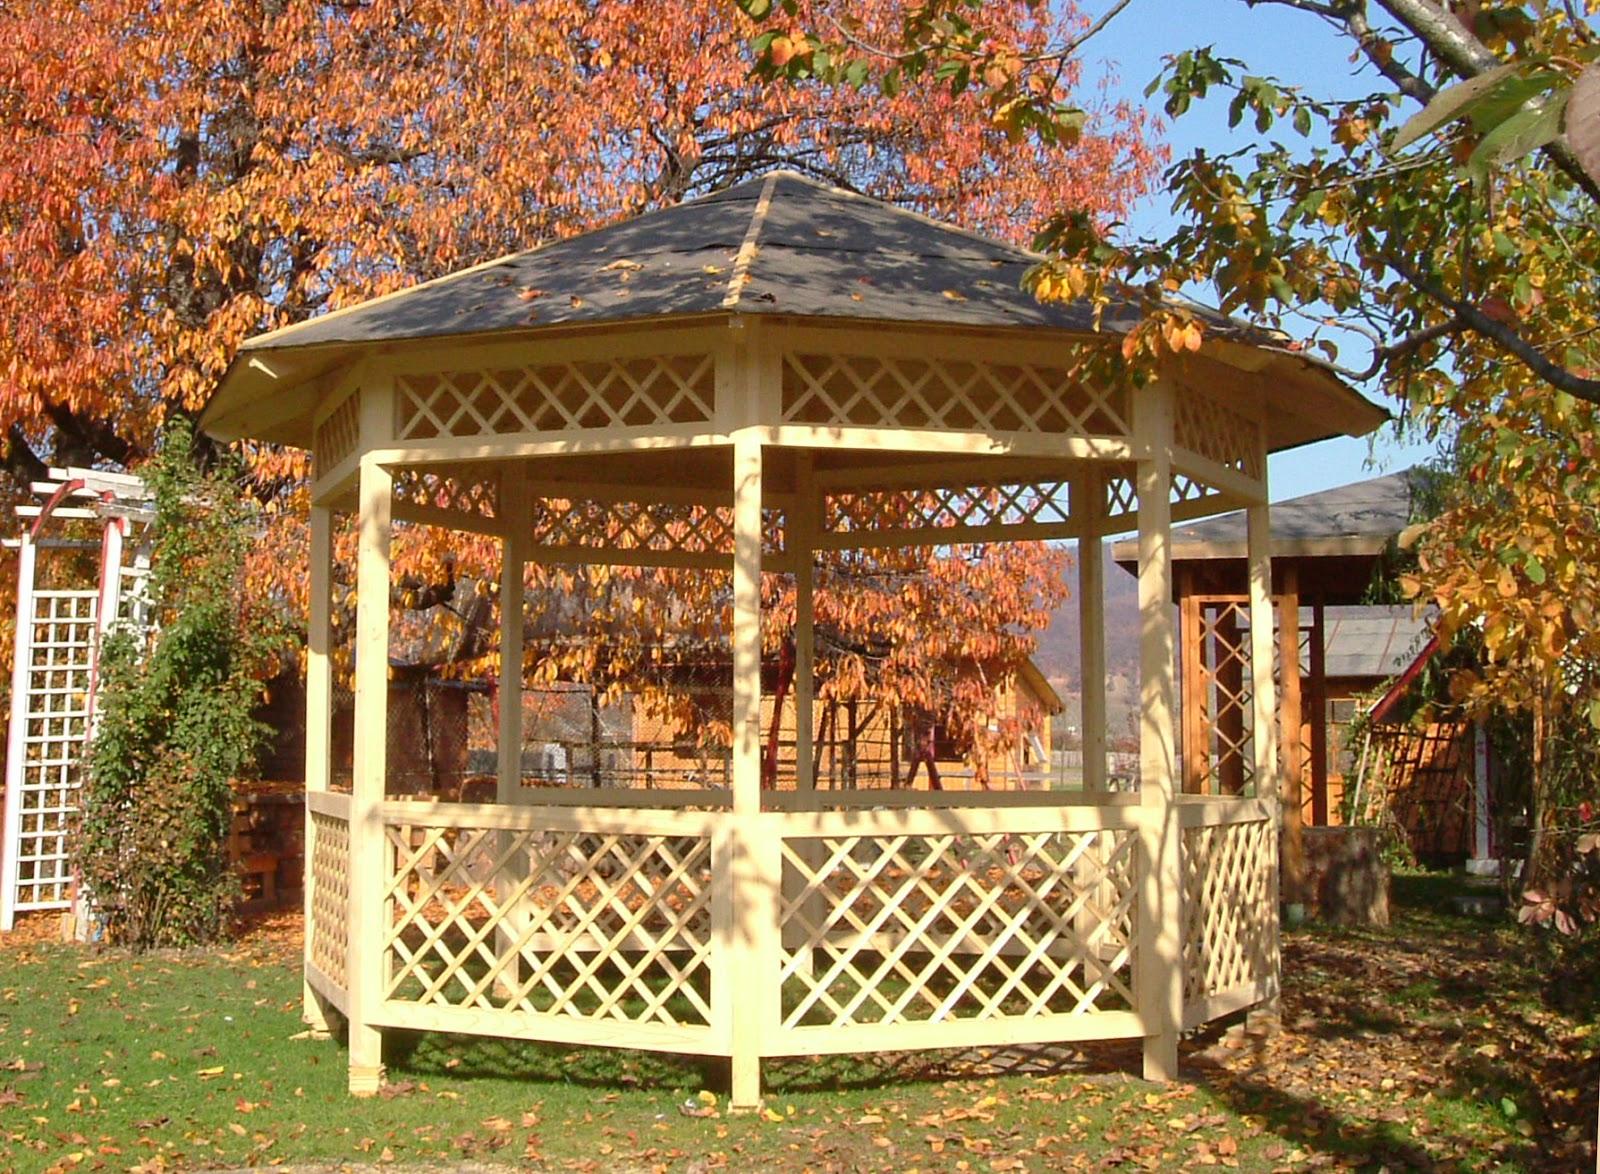 sølund pavillon